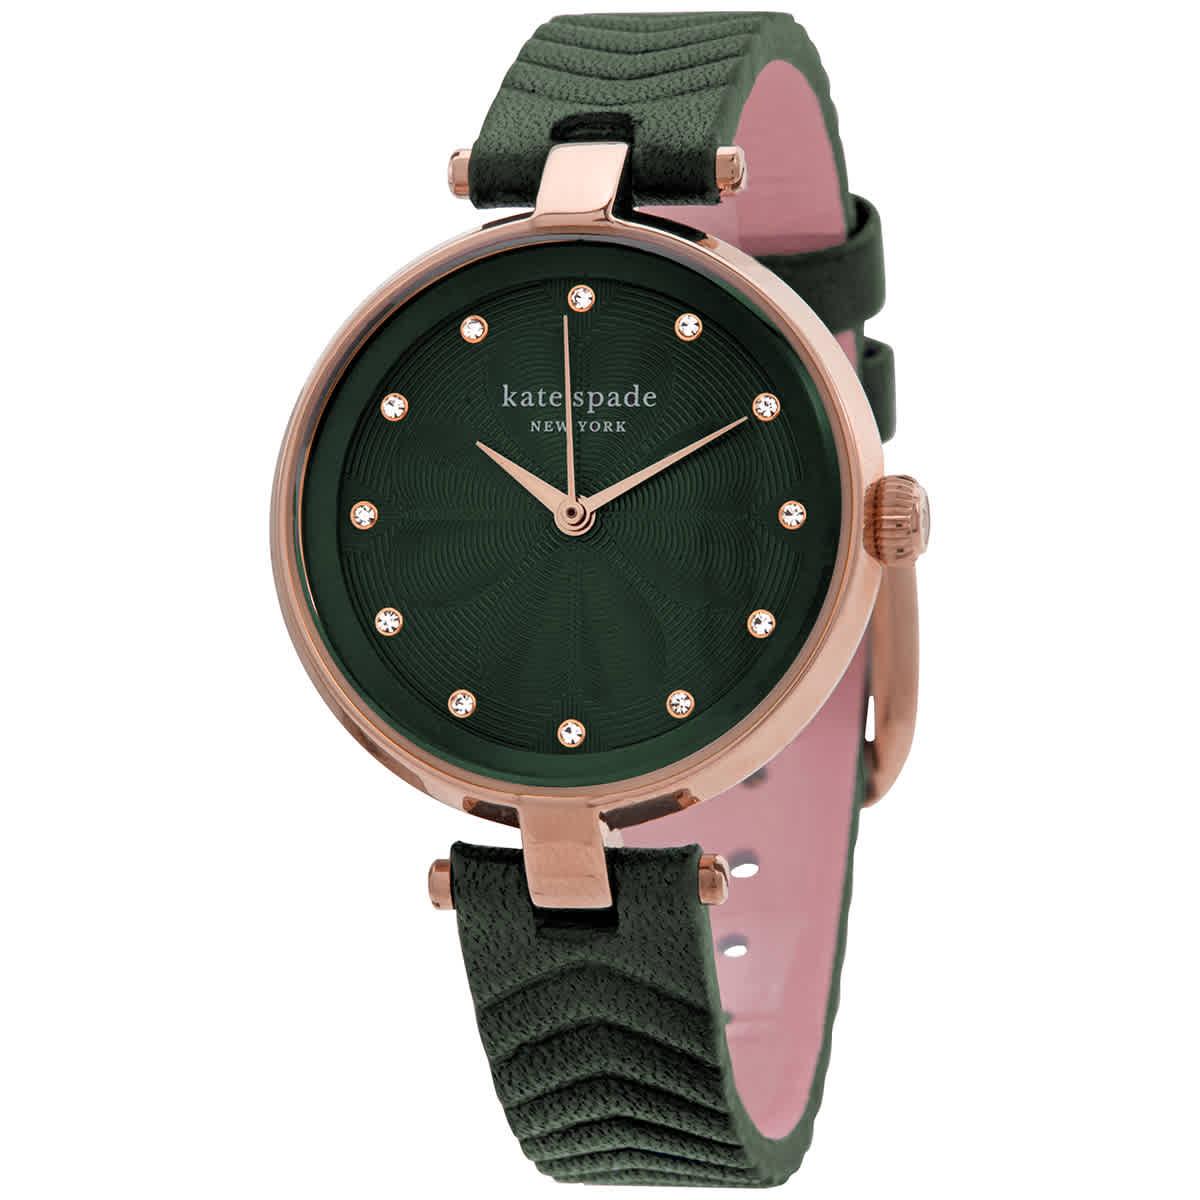 Kate Spade Quartz Green Dial Ladies Watch Ksw1544 In Gold Tone,green,pink,rose Gold Tone